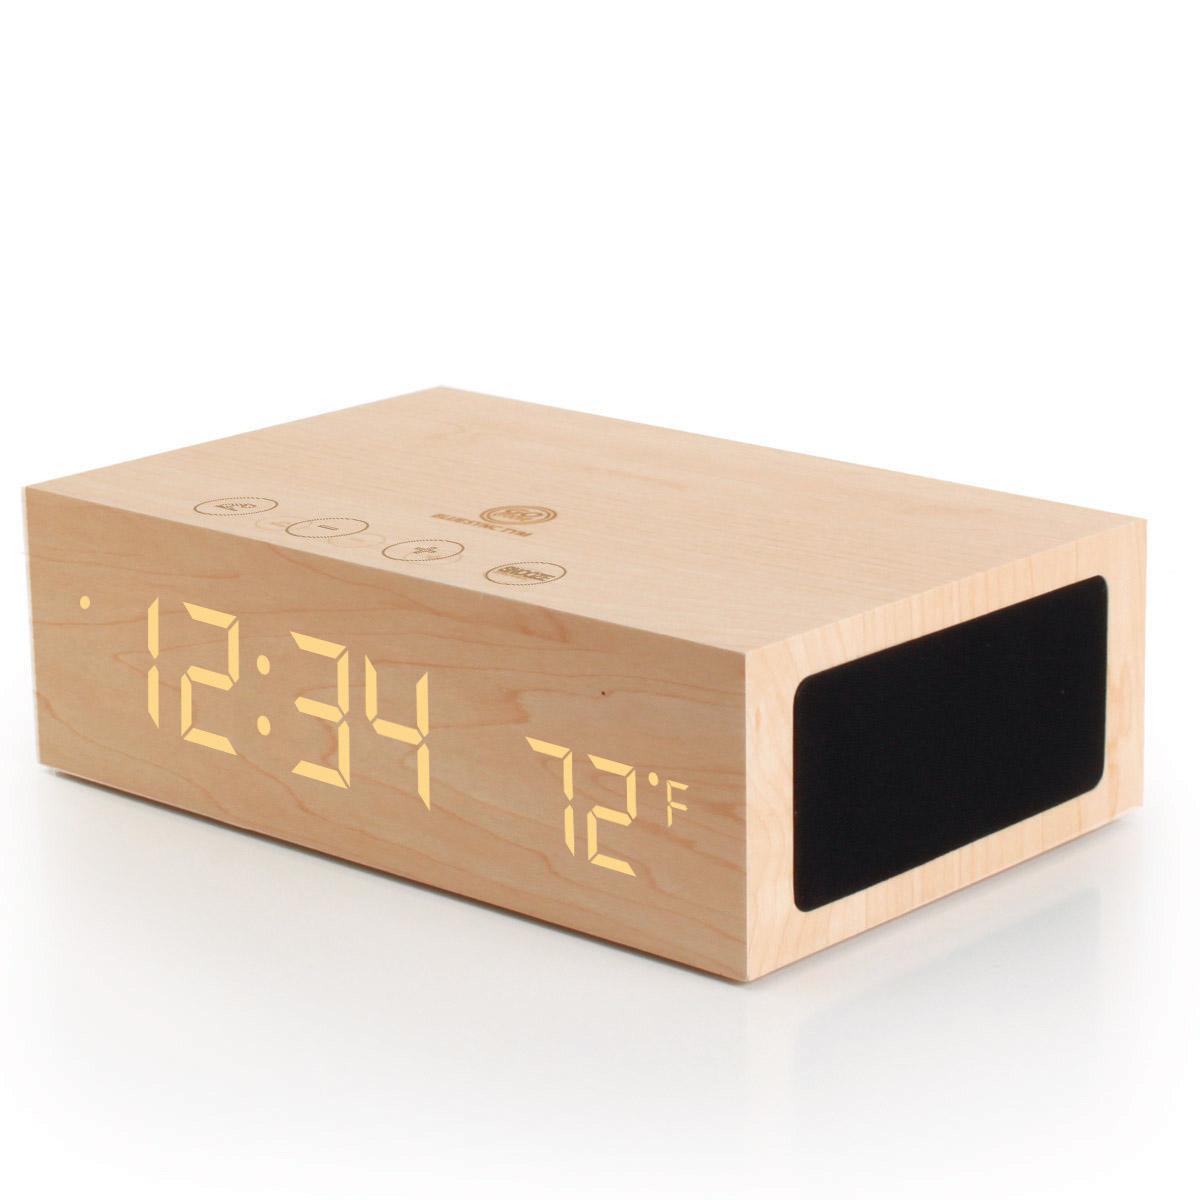 gogroove bluesync tym bluetooth stereo speaker system alarm clock ebay. Black Bedroom Furniture Sets. Home Design Ideas